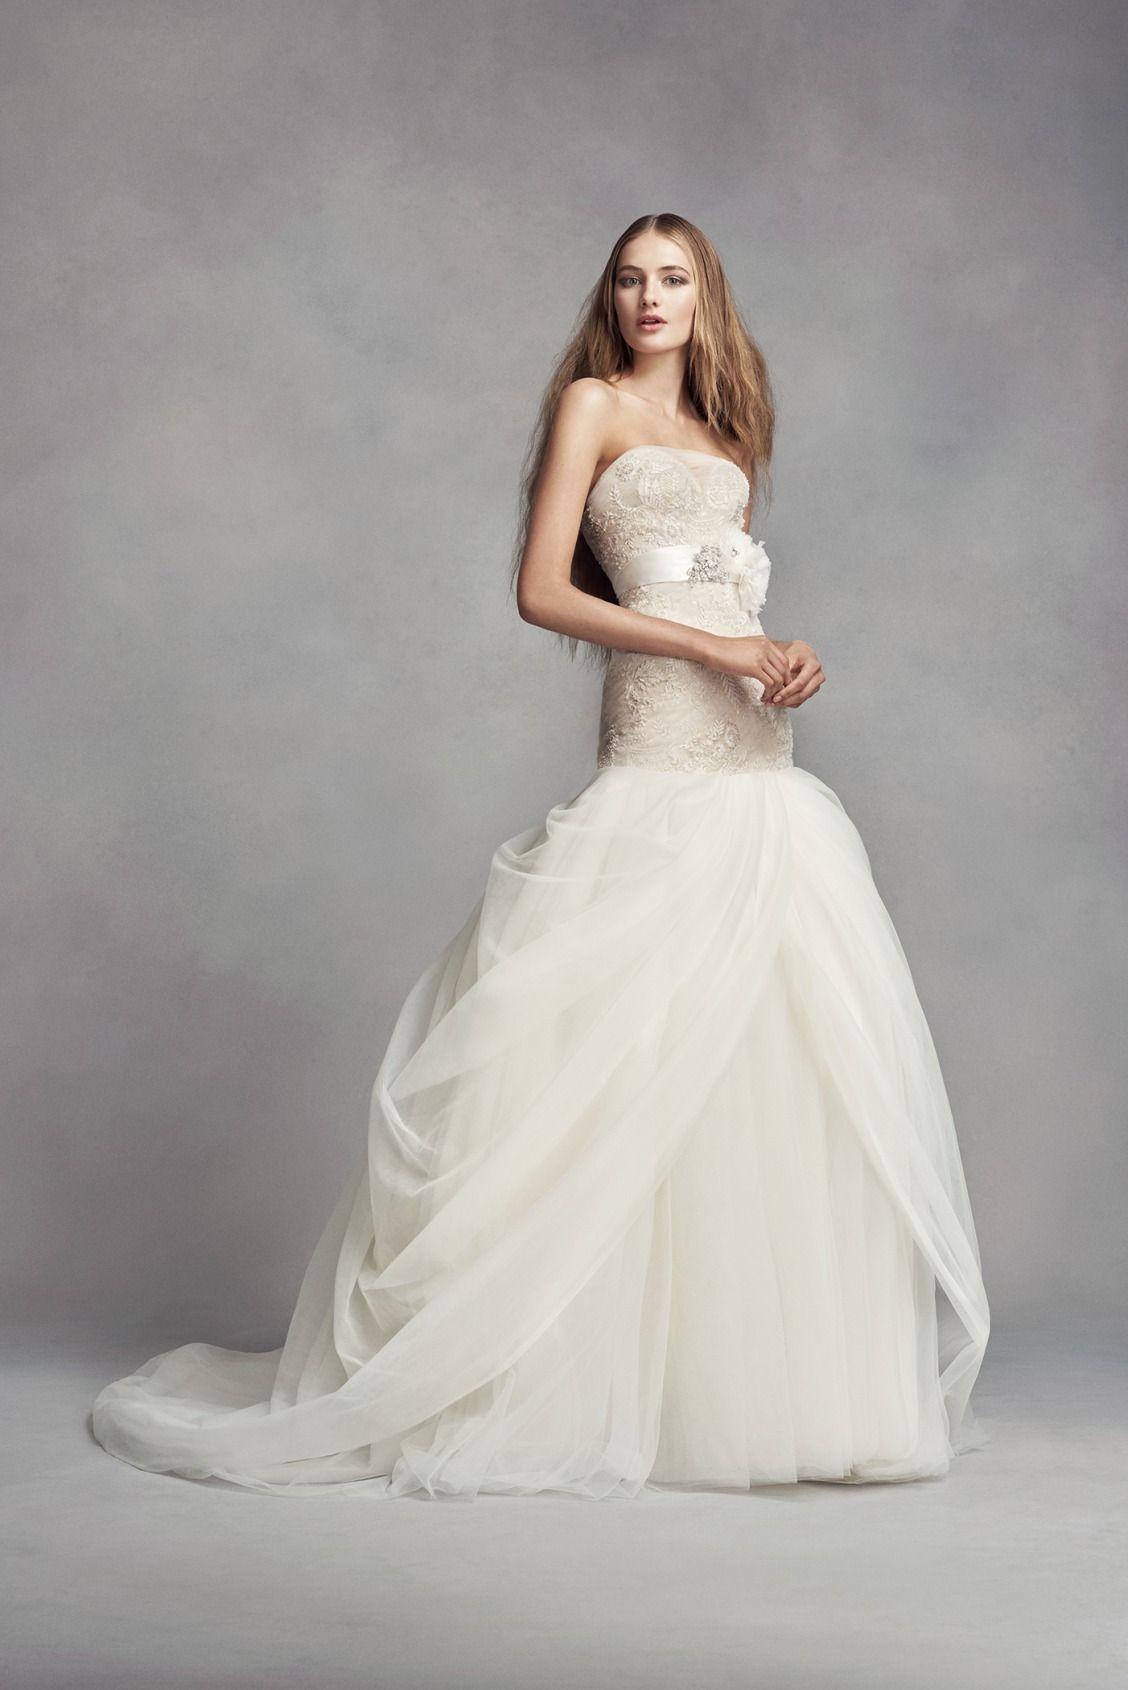 White By Vera Wang Lace Trumpet Wedding Dress David S Bridal Trumpet Wedding Dress Lace Davids Bridal Wedding Dresses Wedding Dress Styles [ 1690 x 1128 Pixel ]